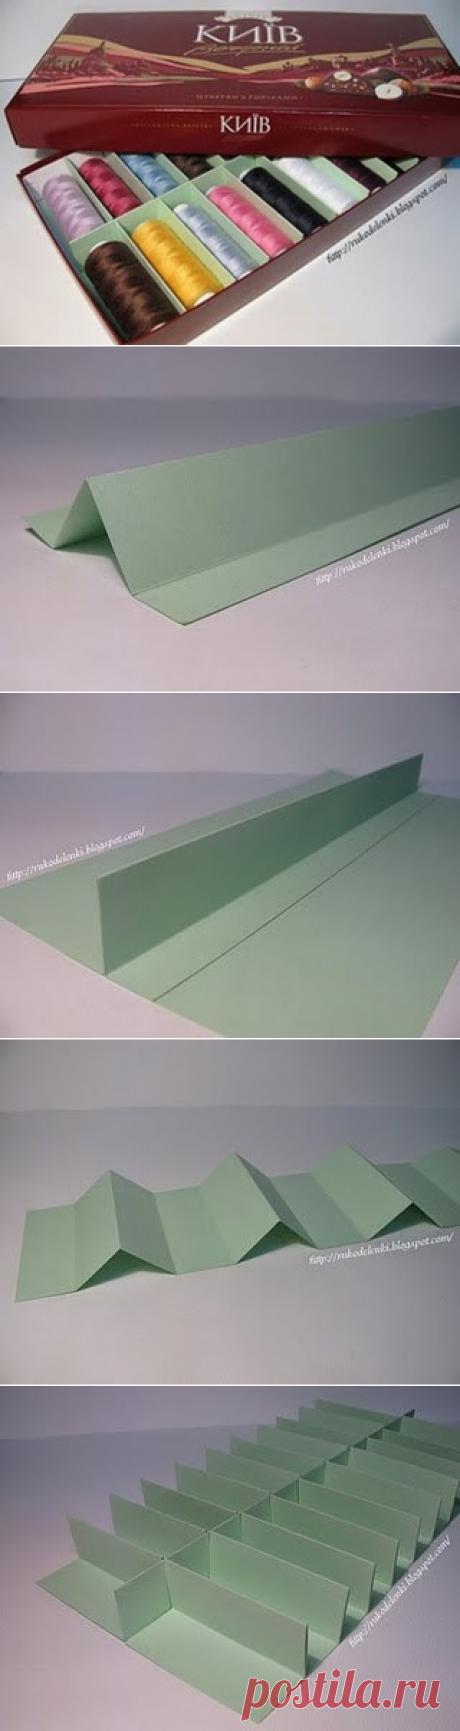 Коробочка для хранения ниток